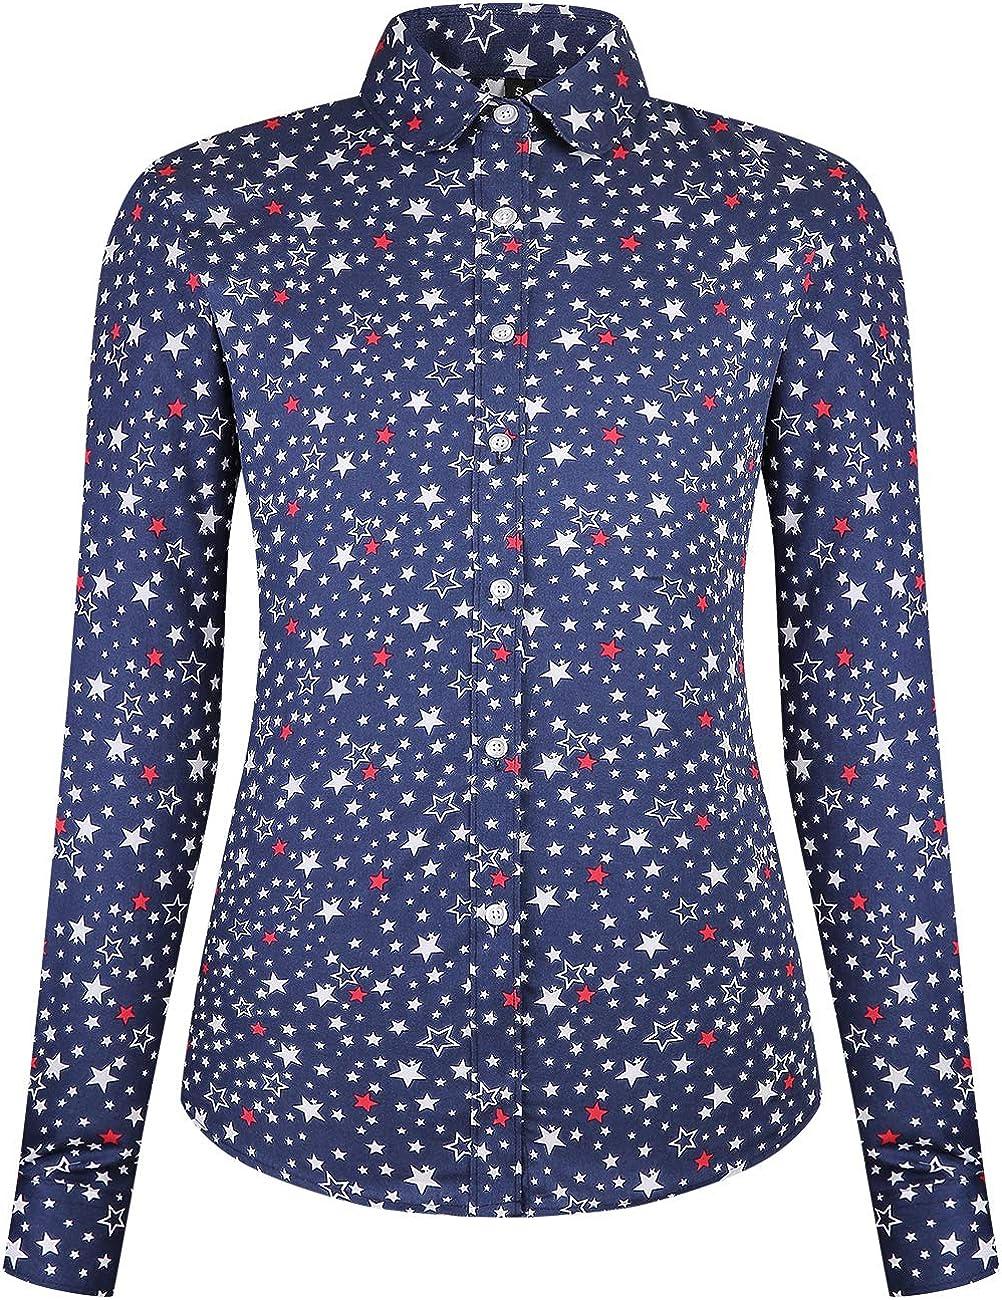 DOKKIA Women's Tops Casual Shirt Long Sleeve Polka Dot Button Down Work Dress Blouses